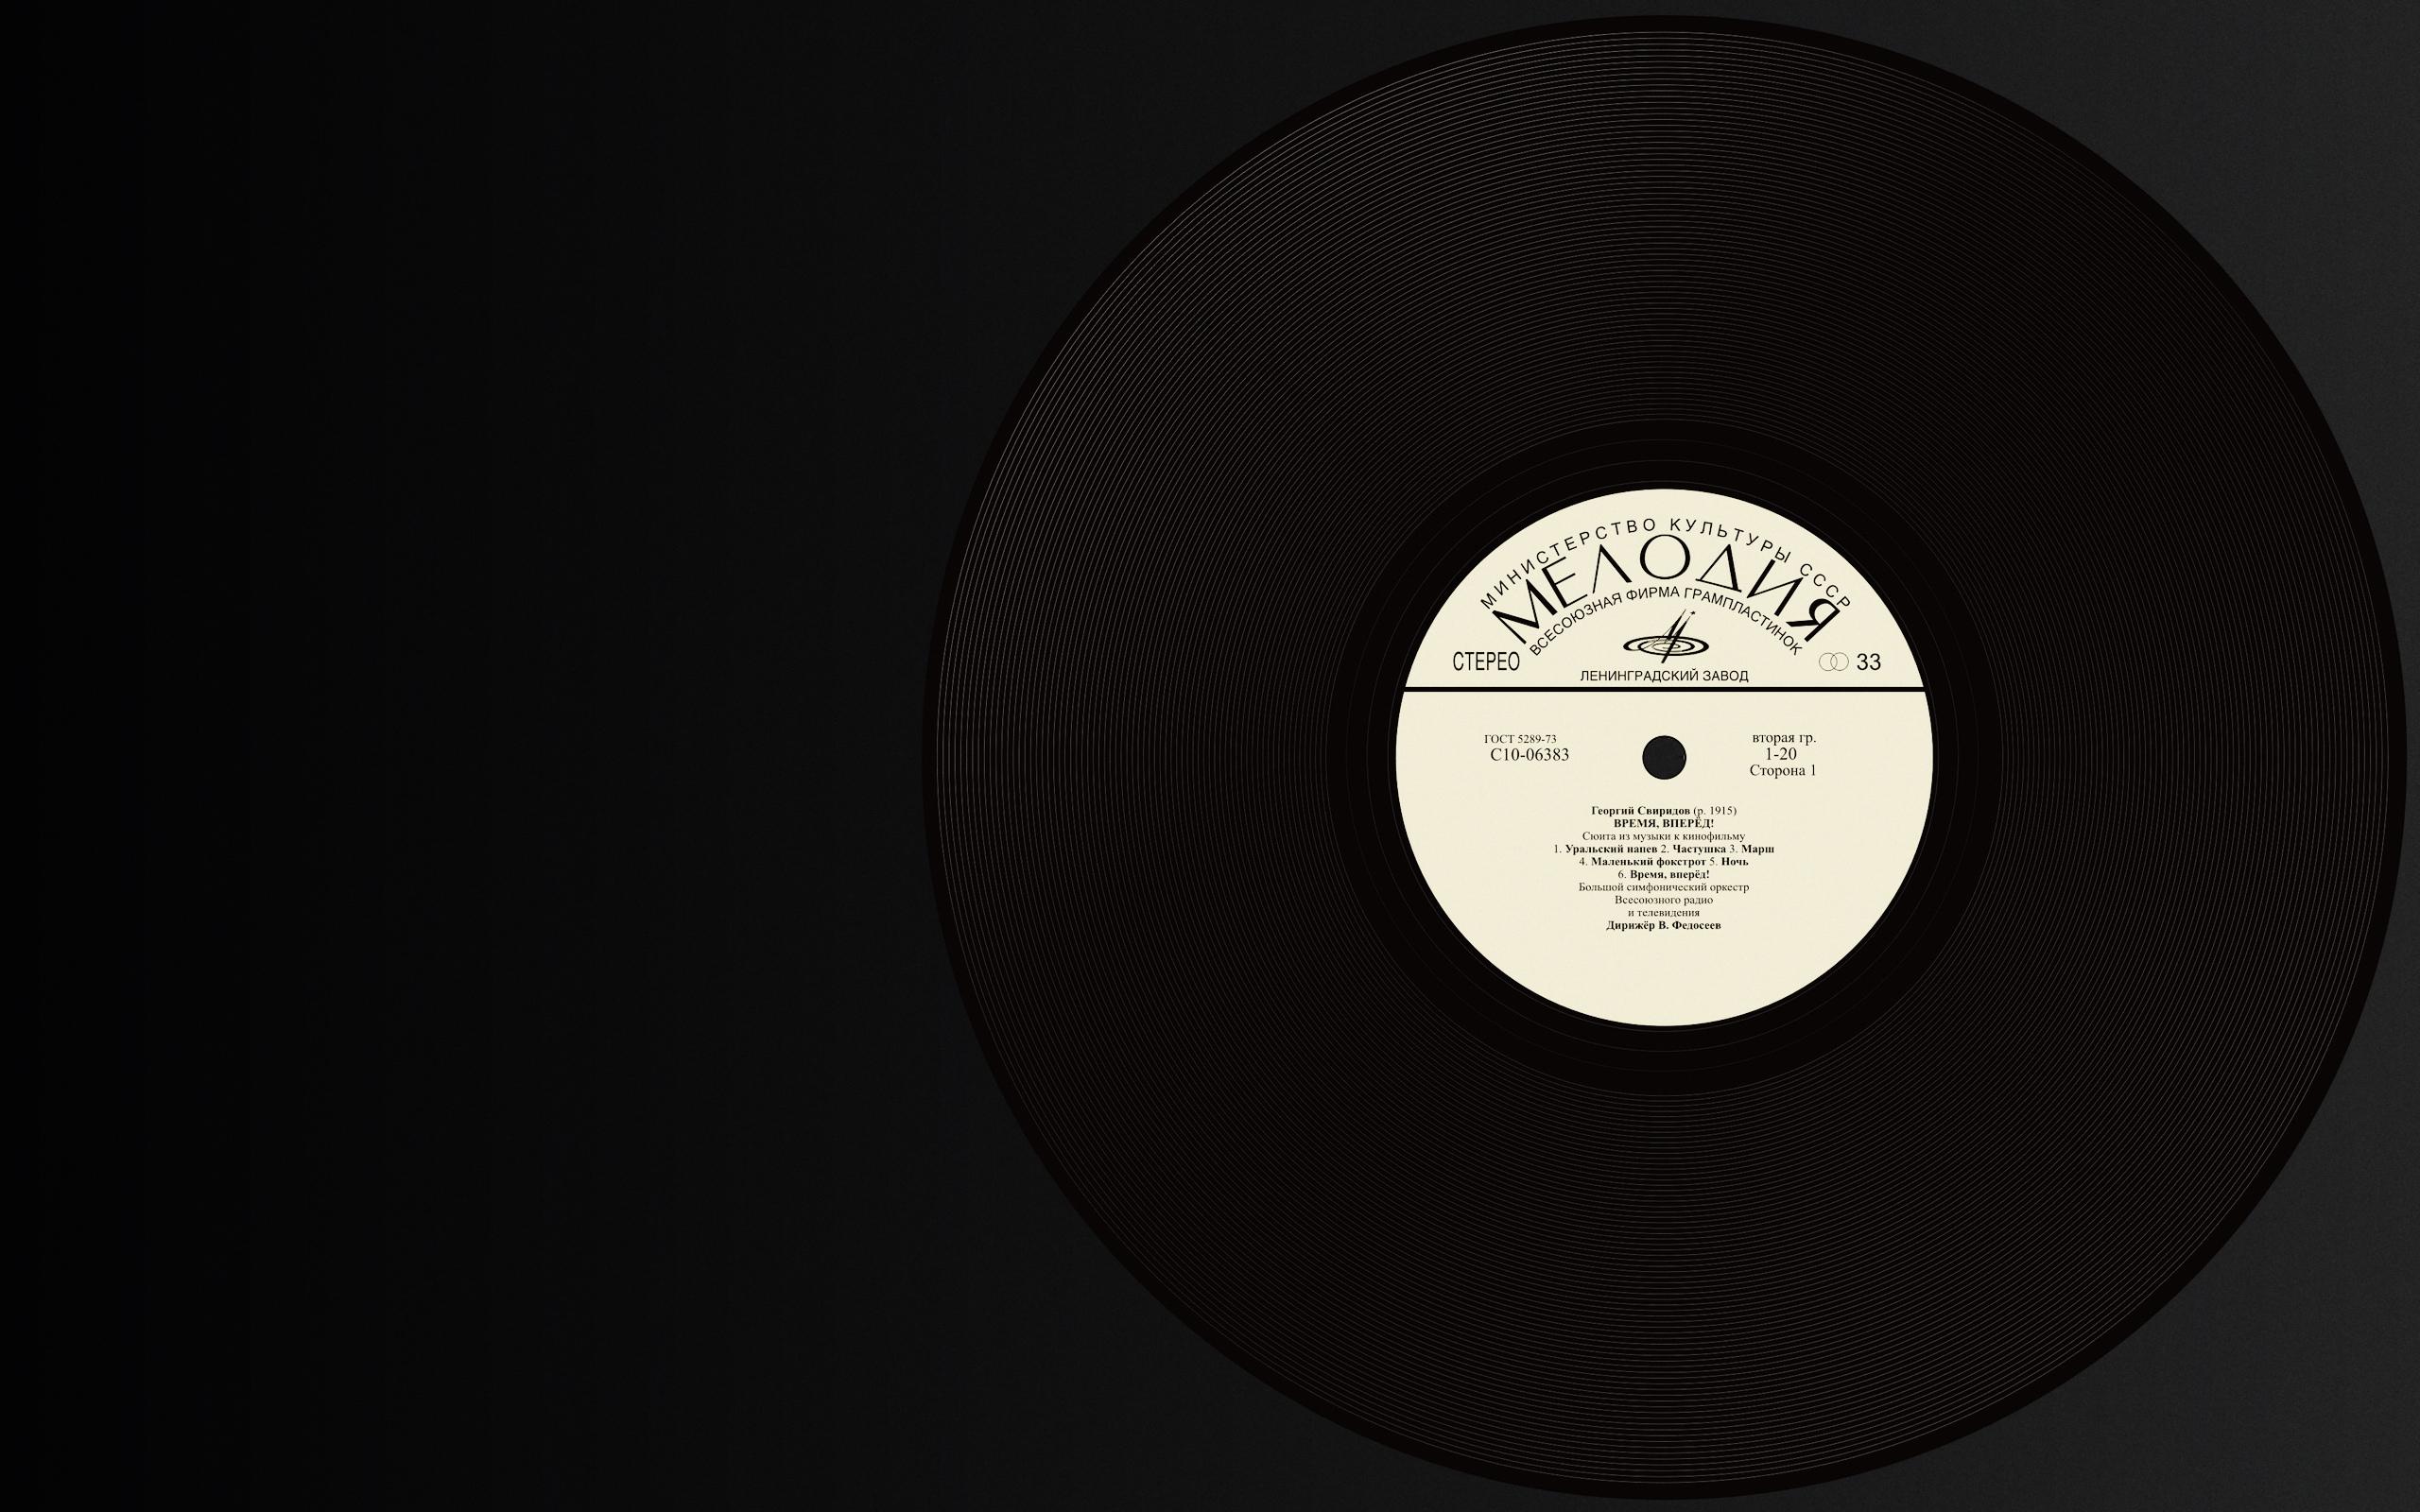 Vinyl Record black photography vinyl record 2560x1600